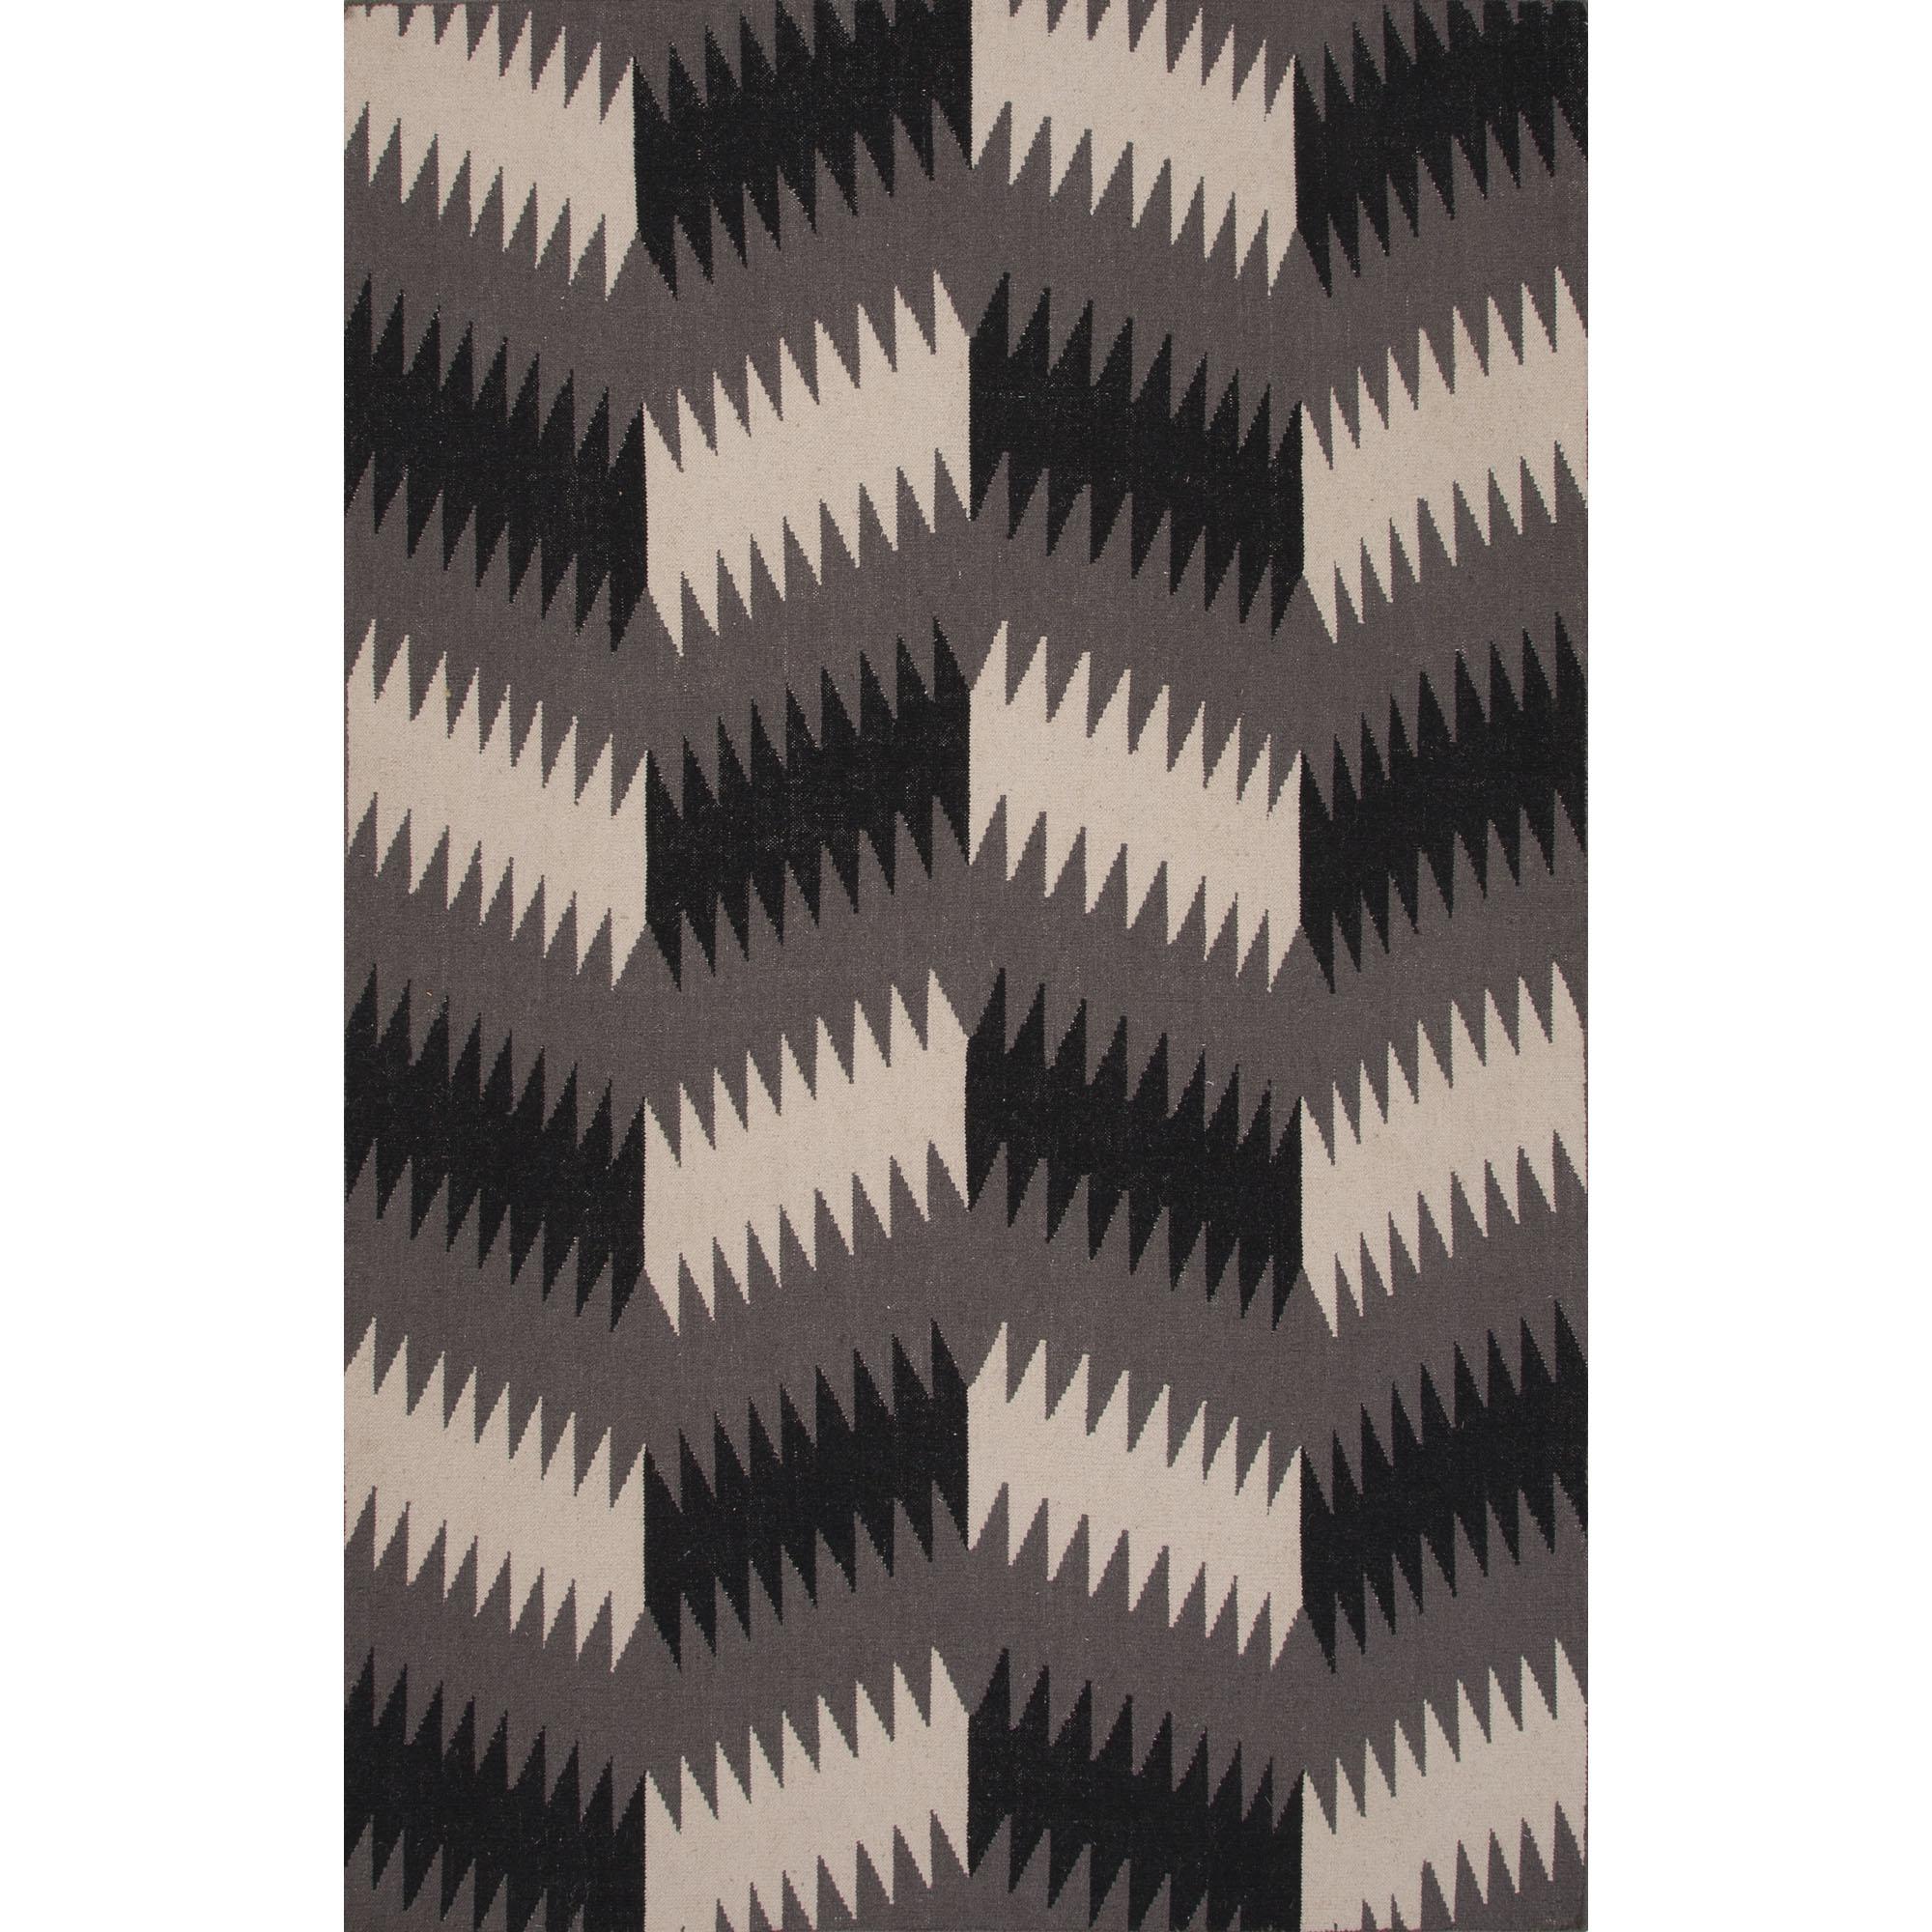 JAIPUR Rugs Traditions Modern Flat Weave 8 x 11 Rug - Item Number: RUG122824